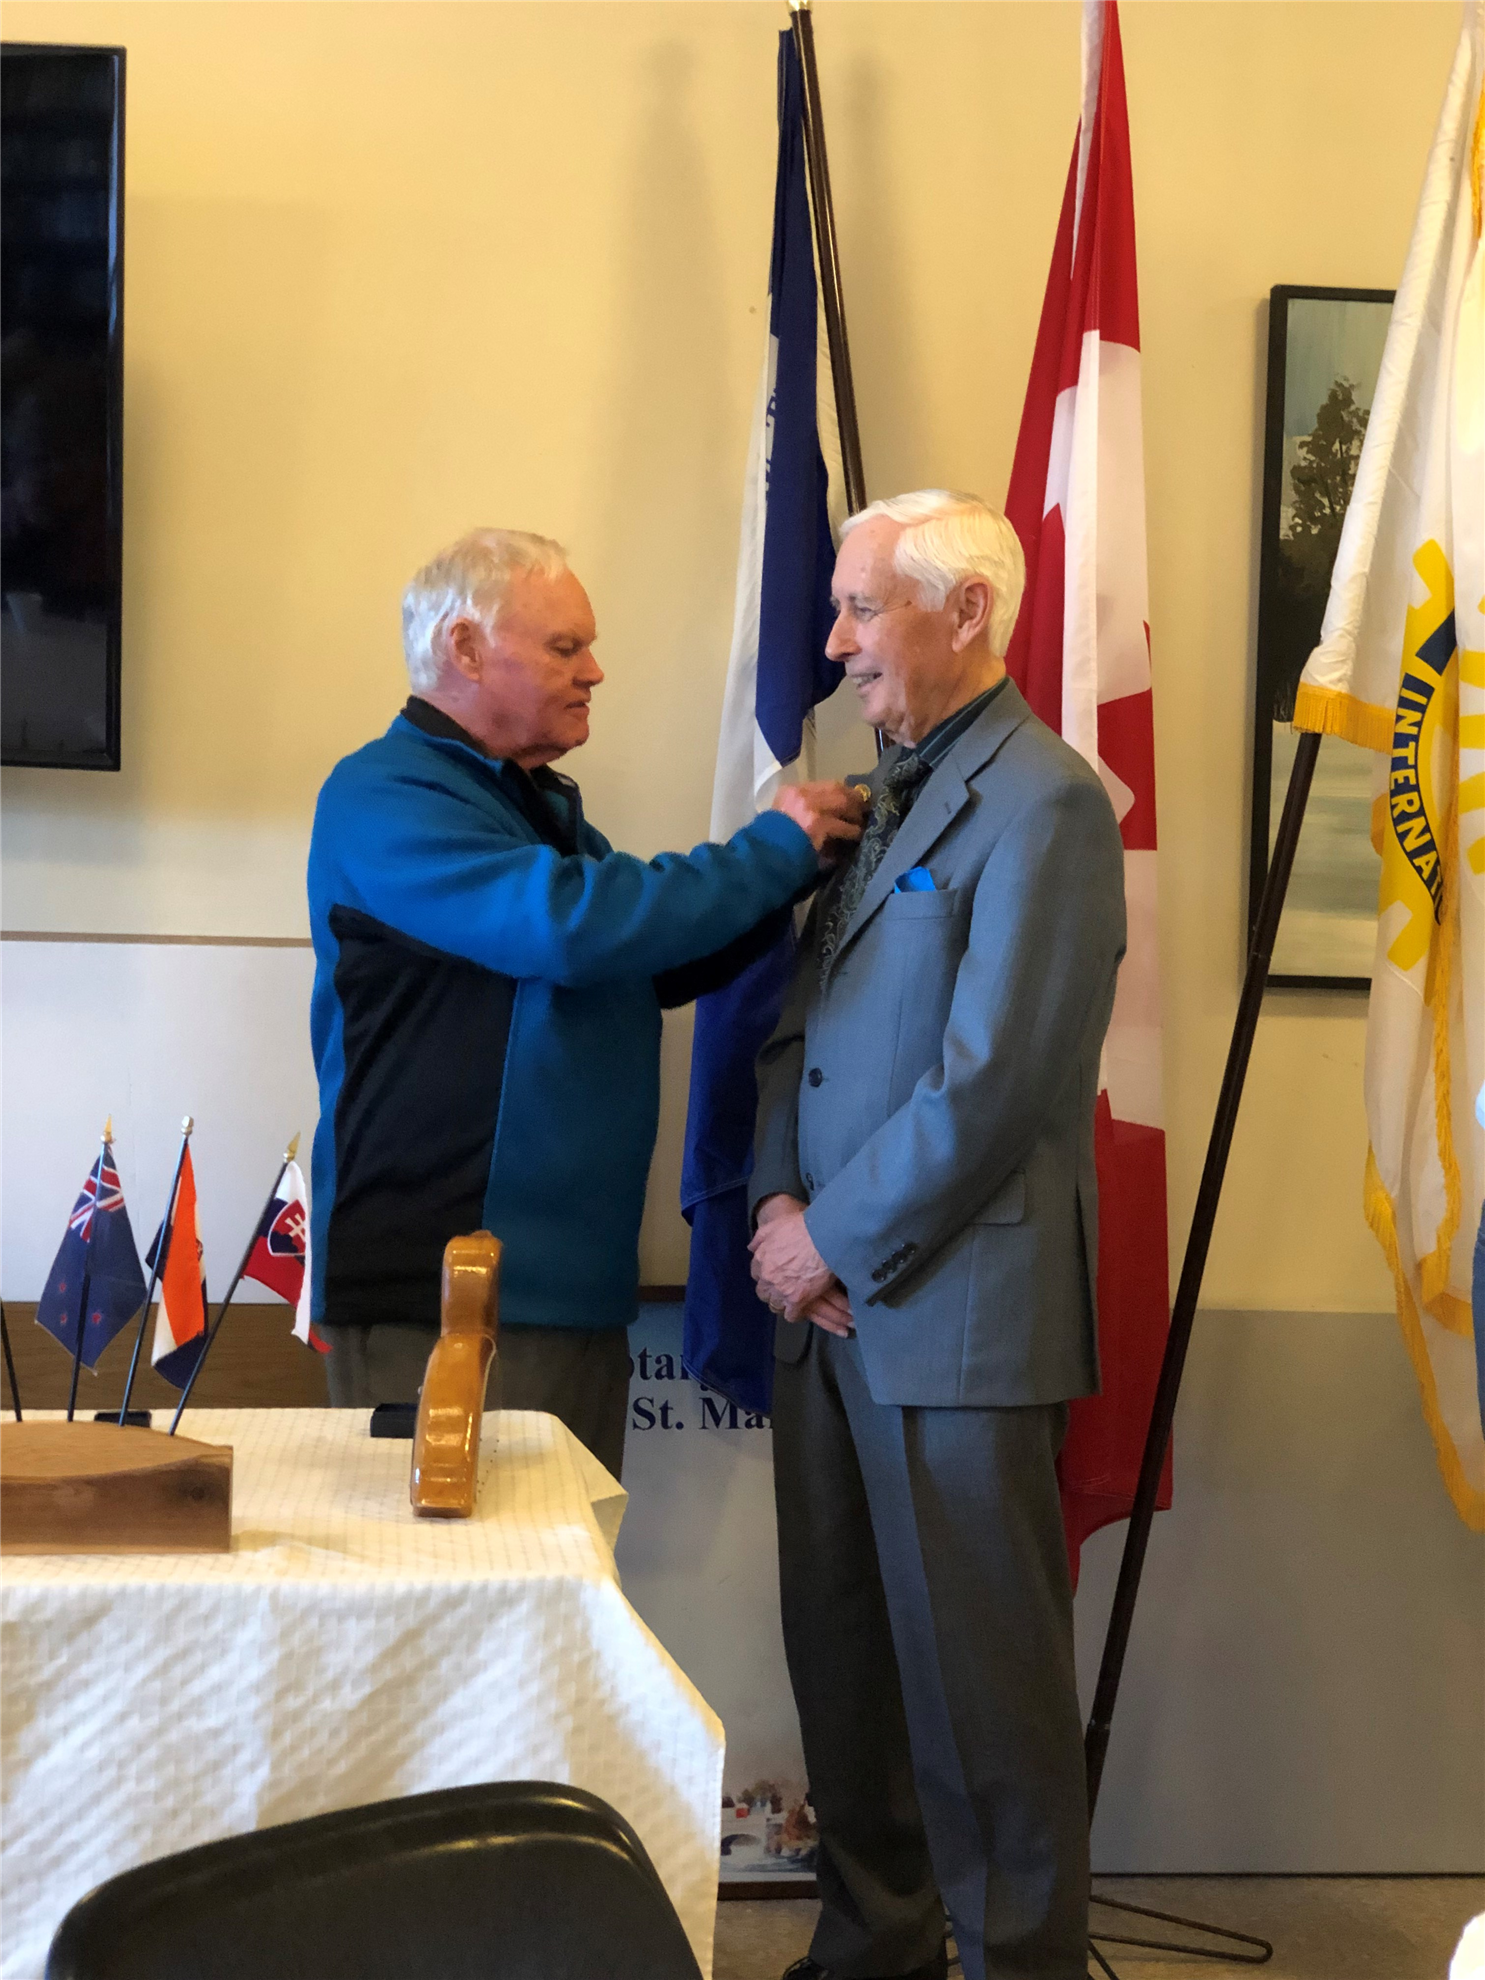 PH presentations 8April 2019 | Rotary Club of St  Marys